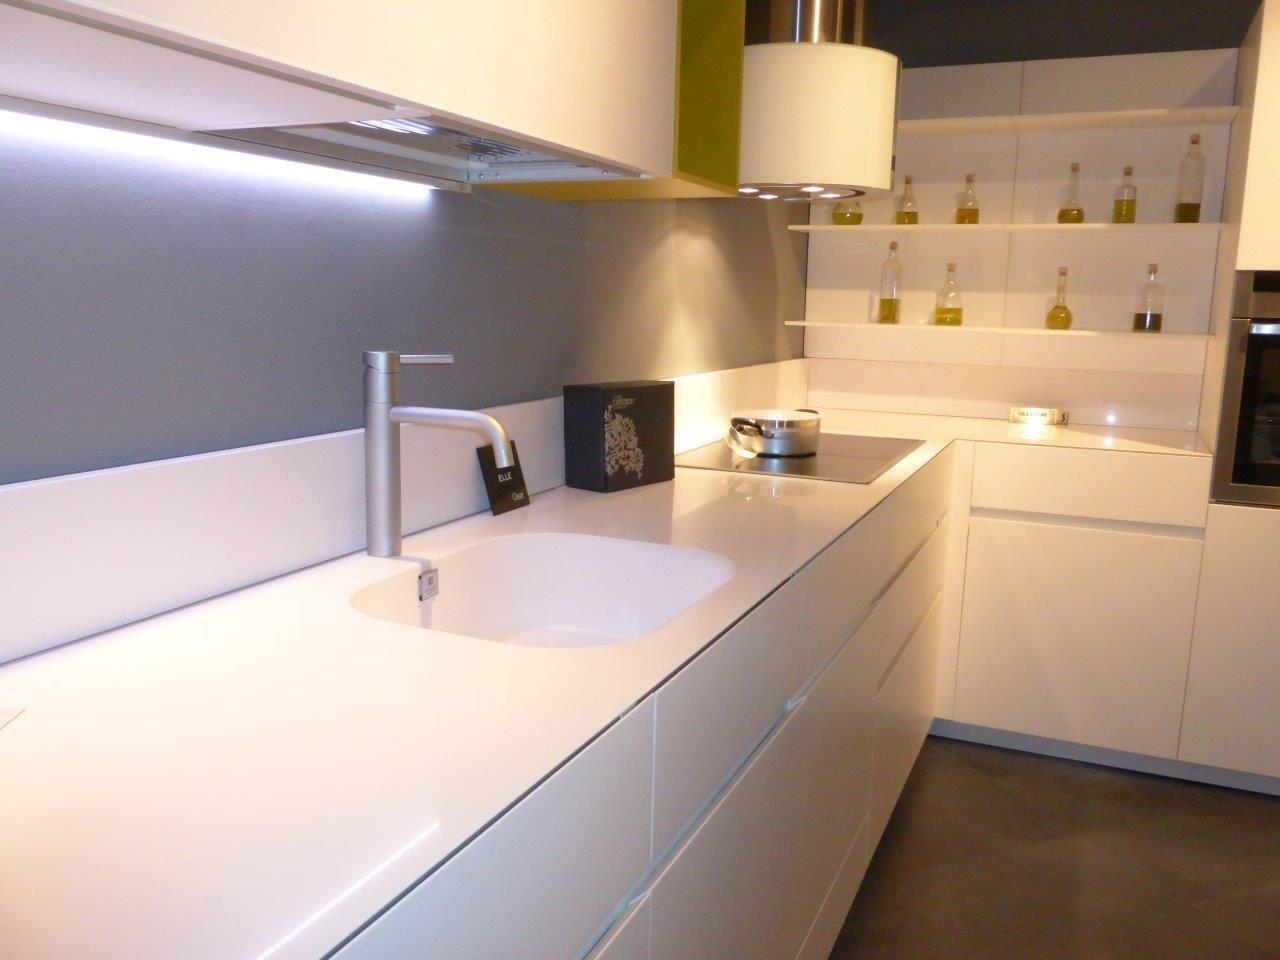 www.outletarredamento.it/img/cucine/cucina-cesar-e...